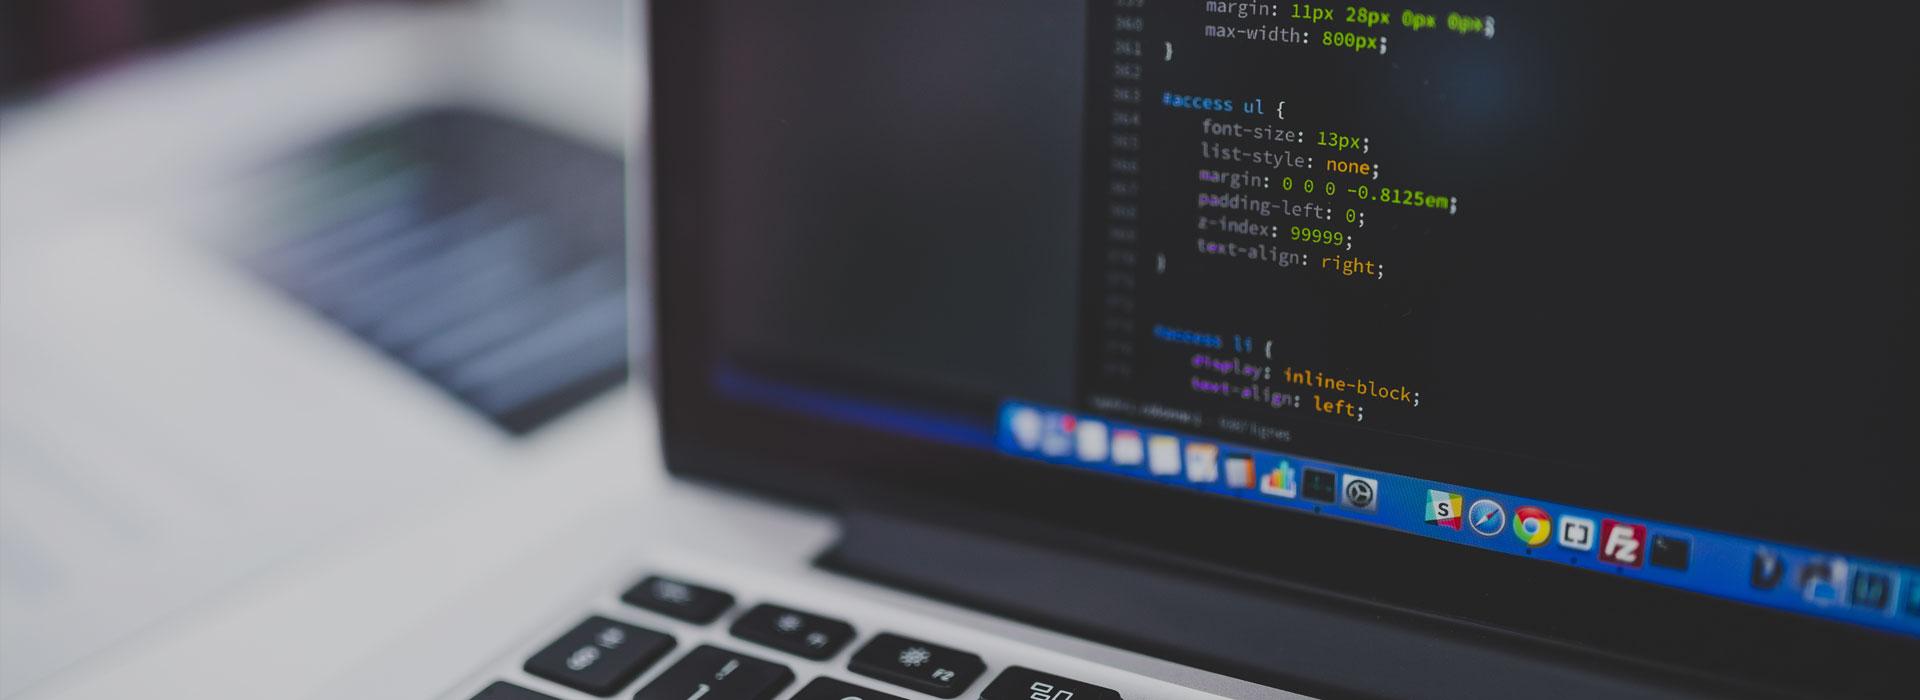 webmoghuls-Web-Development-to-Enhance-Your-Online-Presence